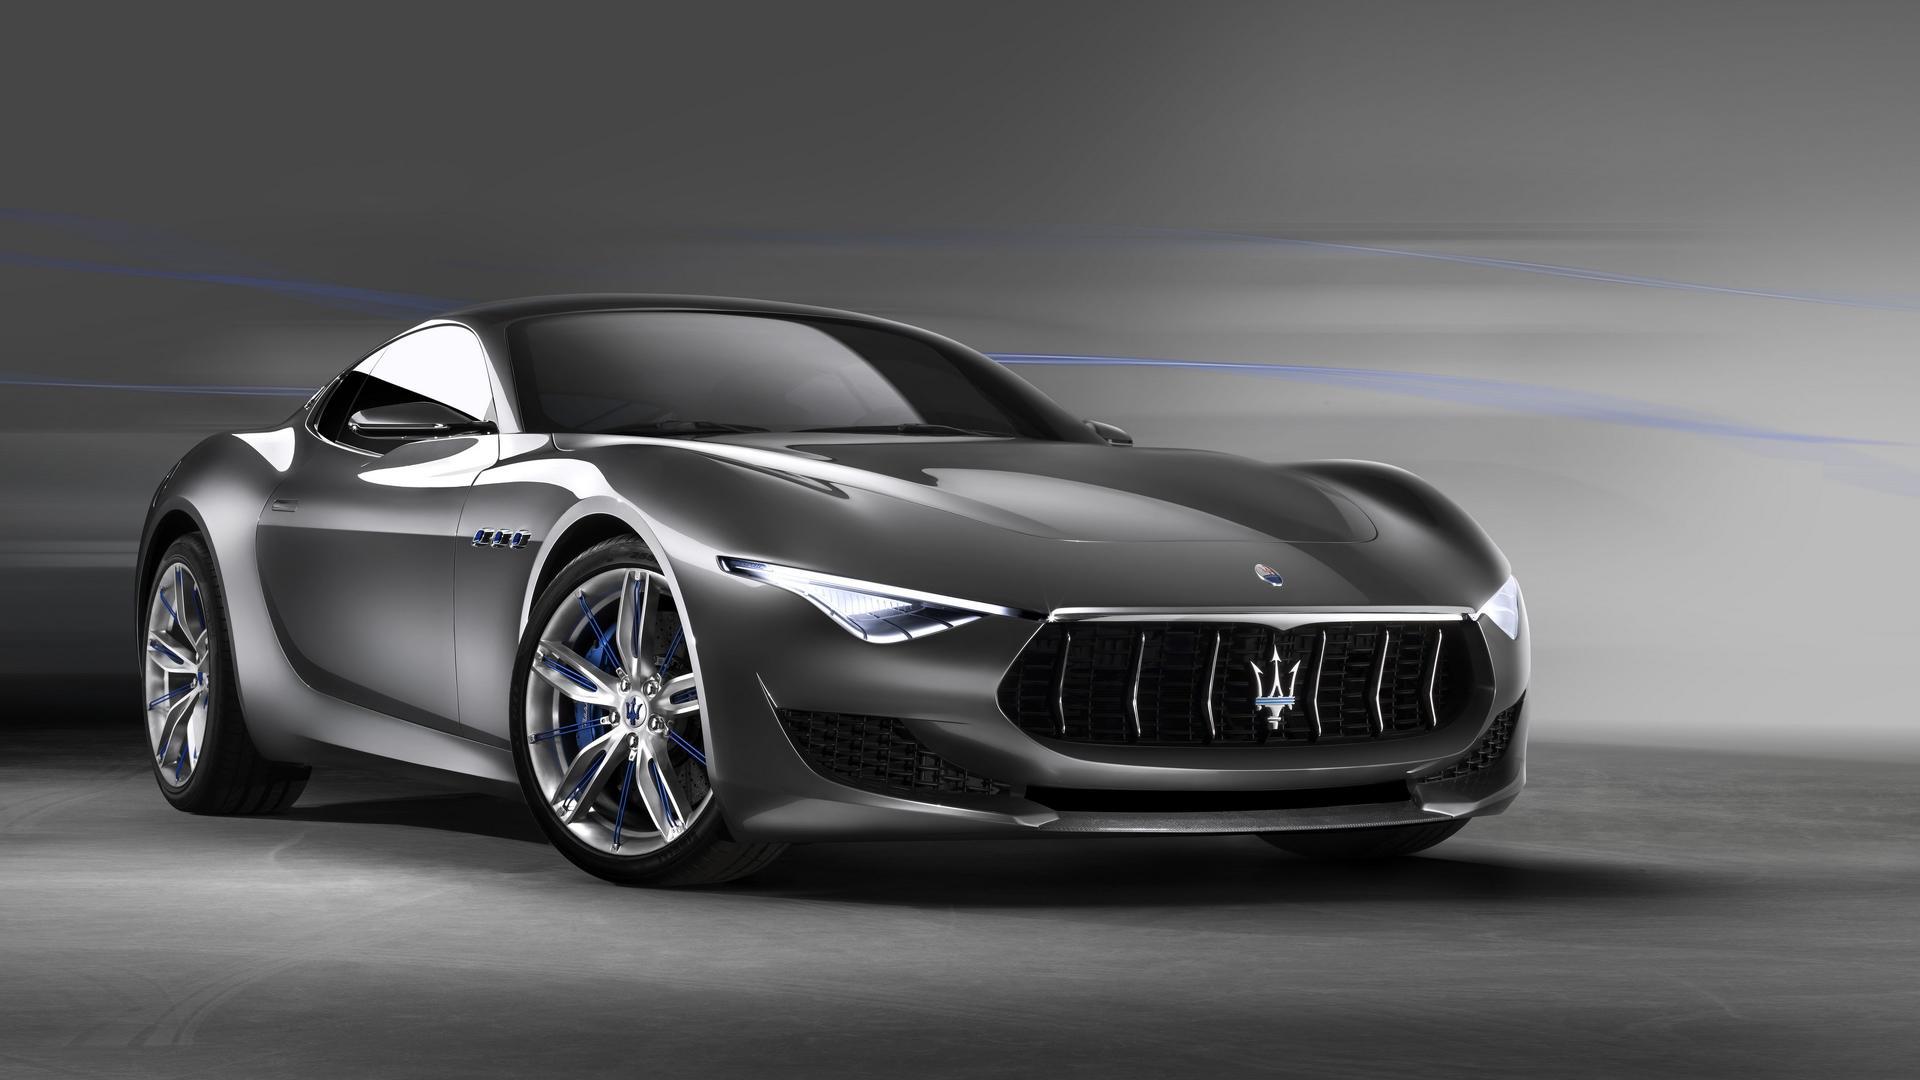 Maserati 2019 >> All New Maserati Models From 2019 Will Be Electrified